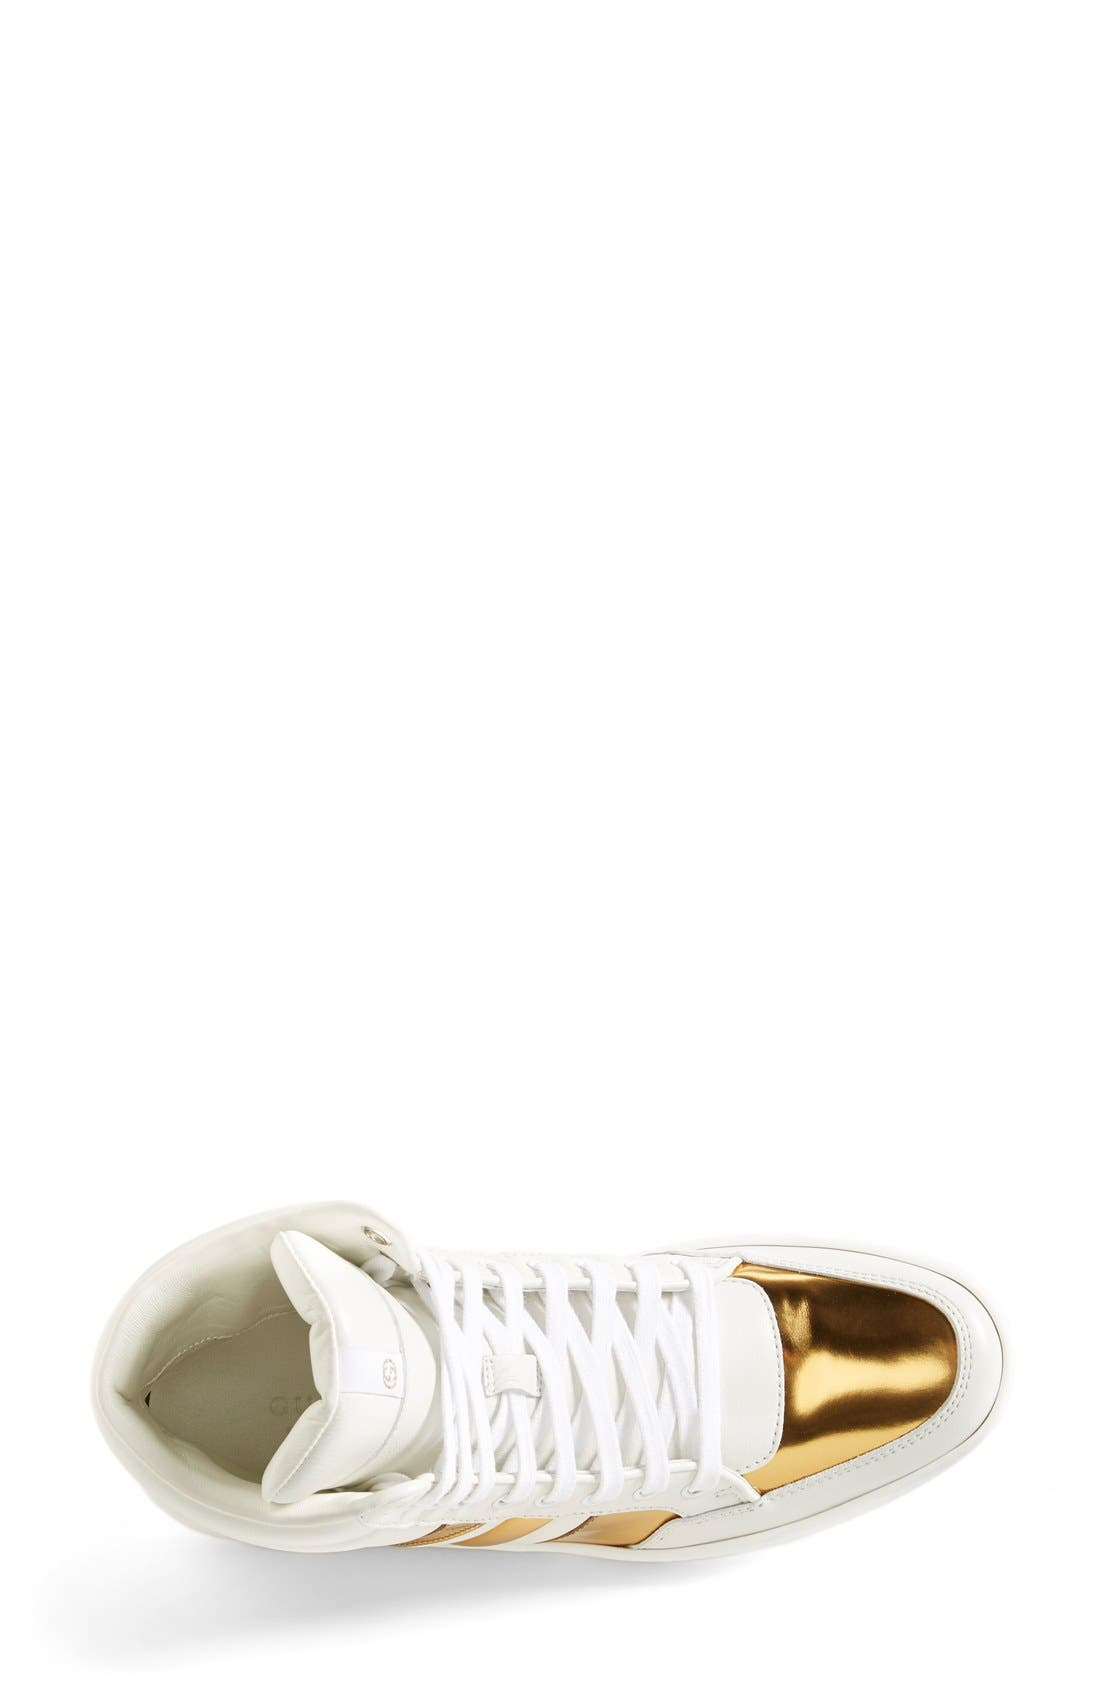 Alternate Image 3  - Gucci 'Ronnie' High Top Sneaker (Women)